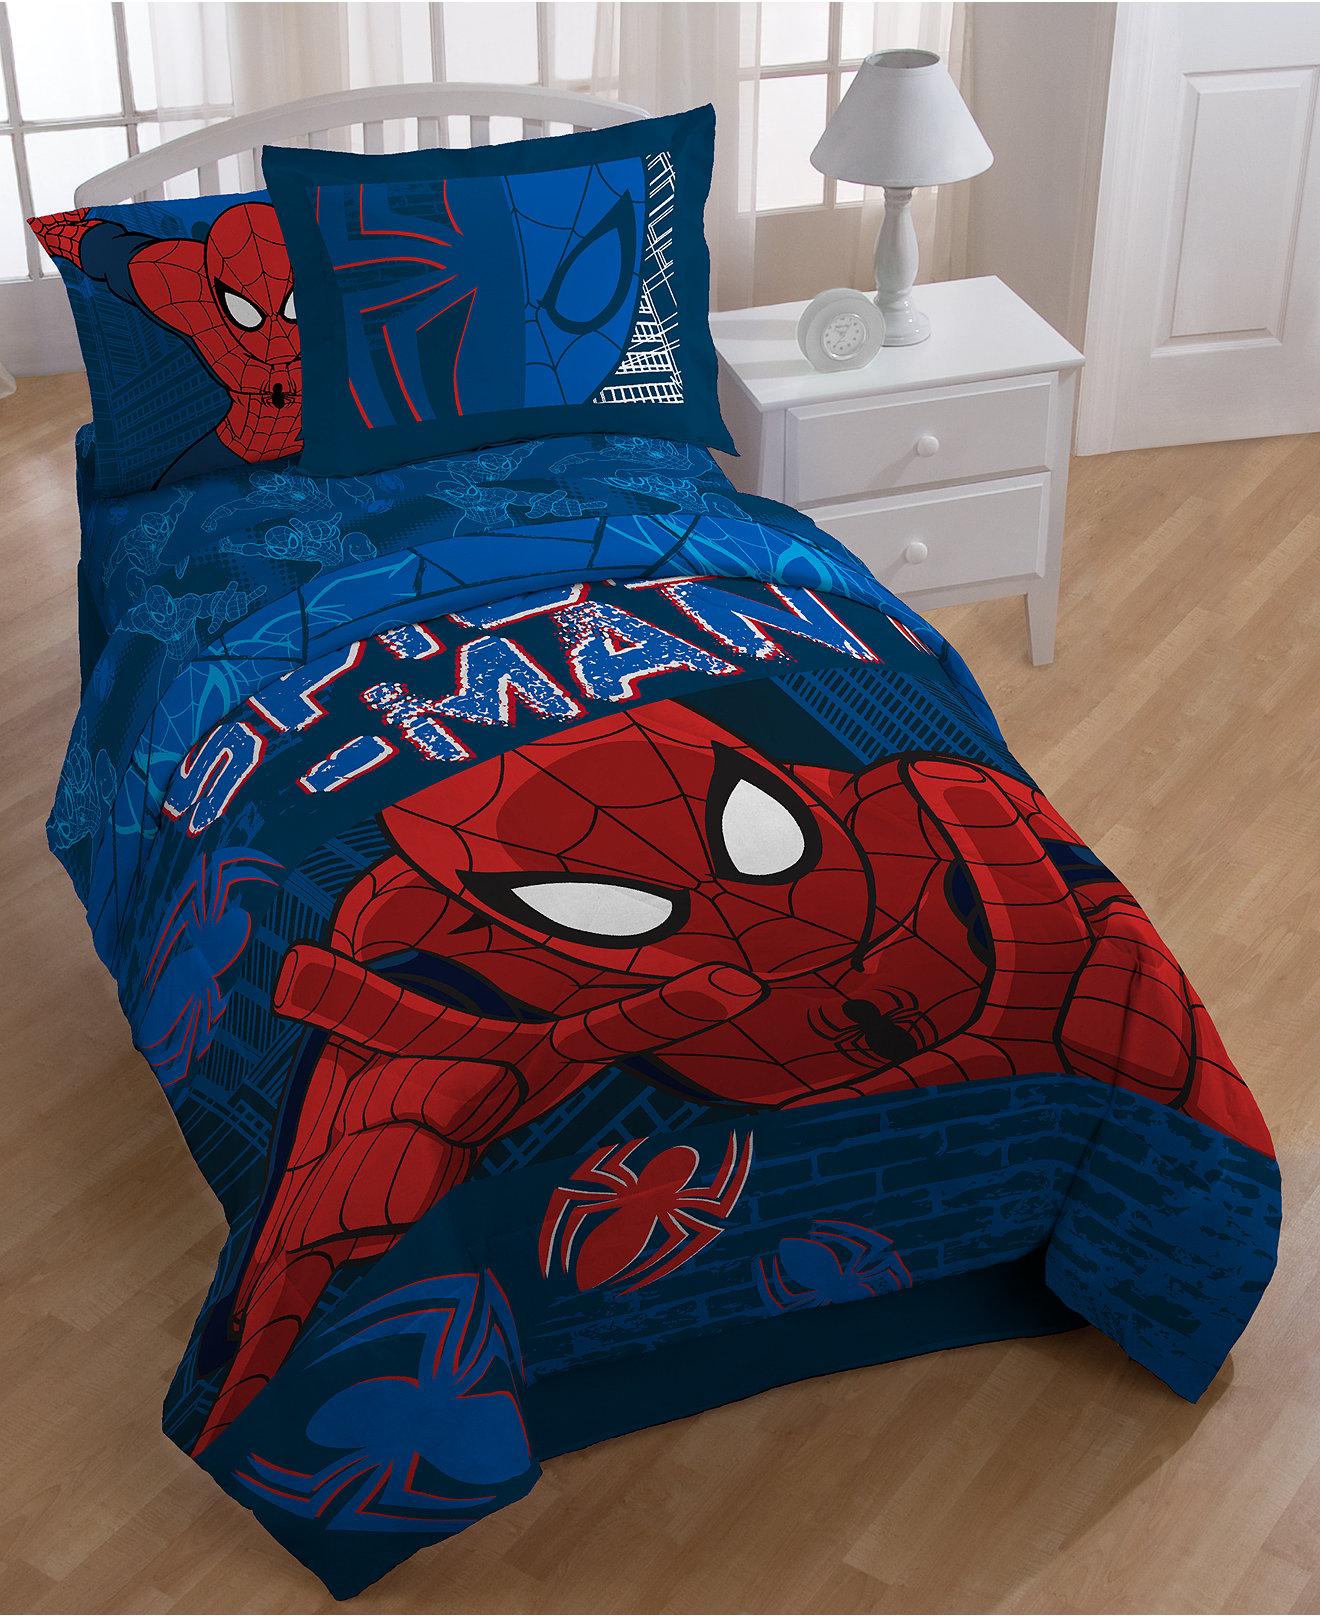 Vintage superhero bedding - Spider Man Graphic Bedding Collection